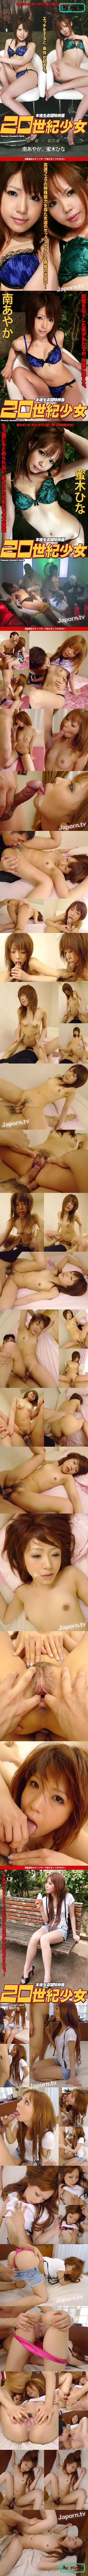 [DRC 002] 20世紀少女 第1章~ 第4章 全集 : 南あやか, 蜜木ひな 蜜木ひな 南あやか Hina Mitsuki DRC Ayaka Minami